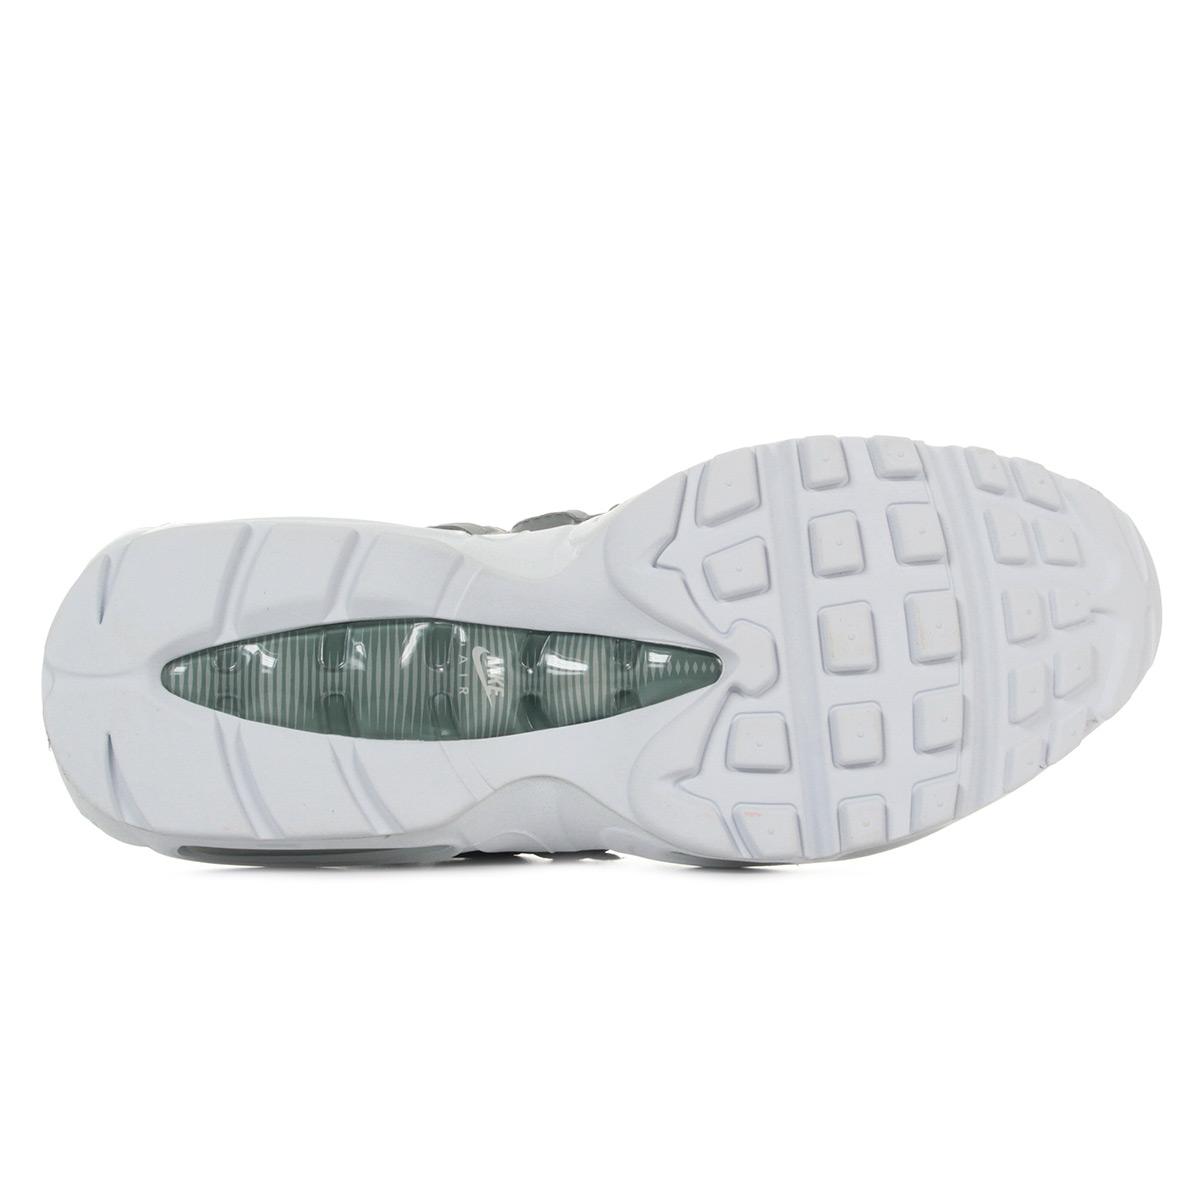 Nike Air max 95 Essential 749766105, Baskets mode homme